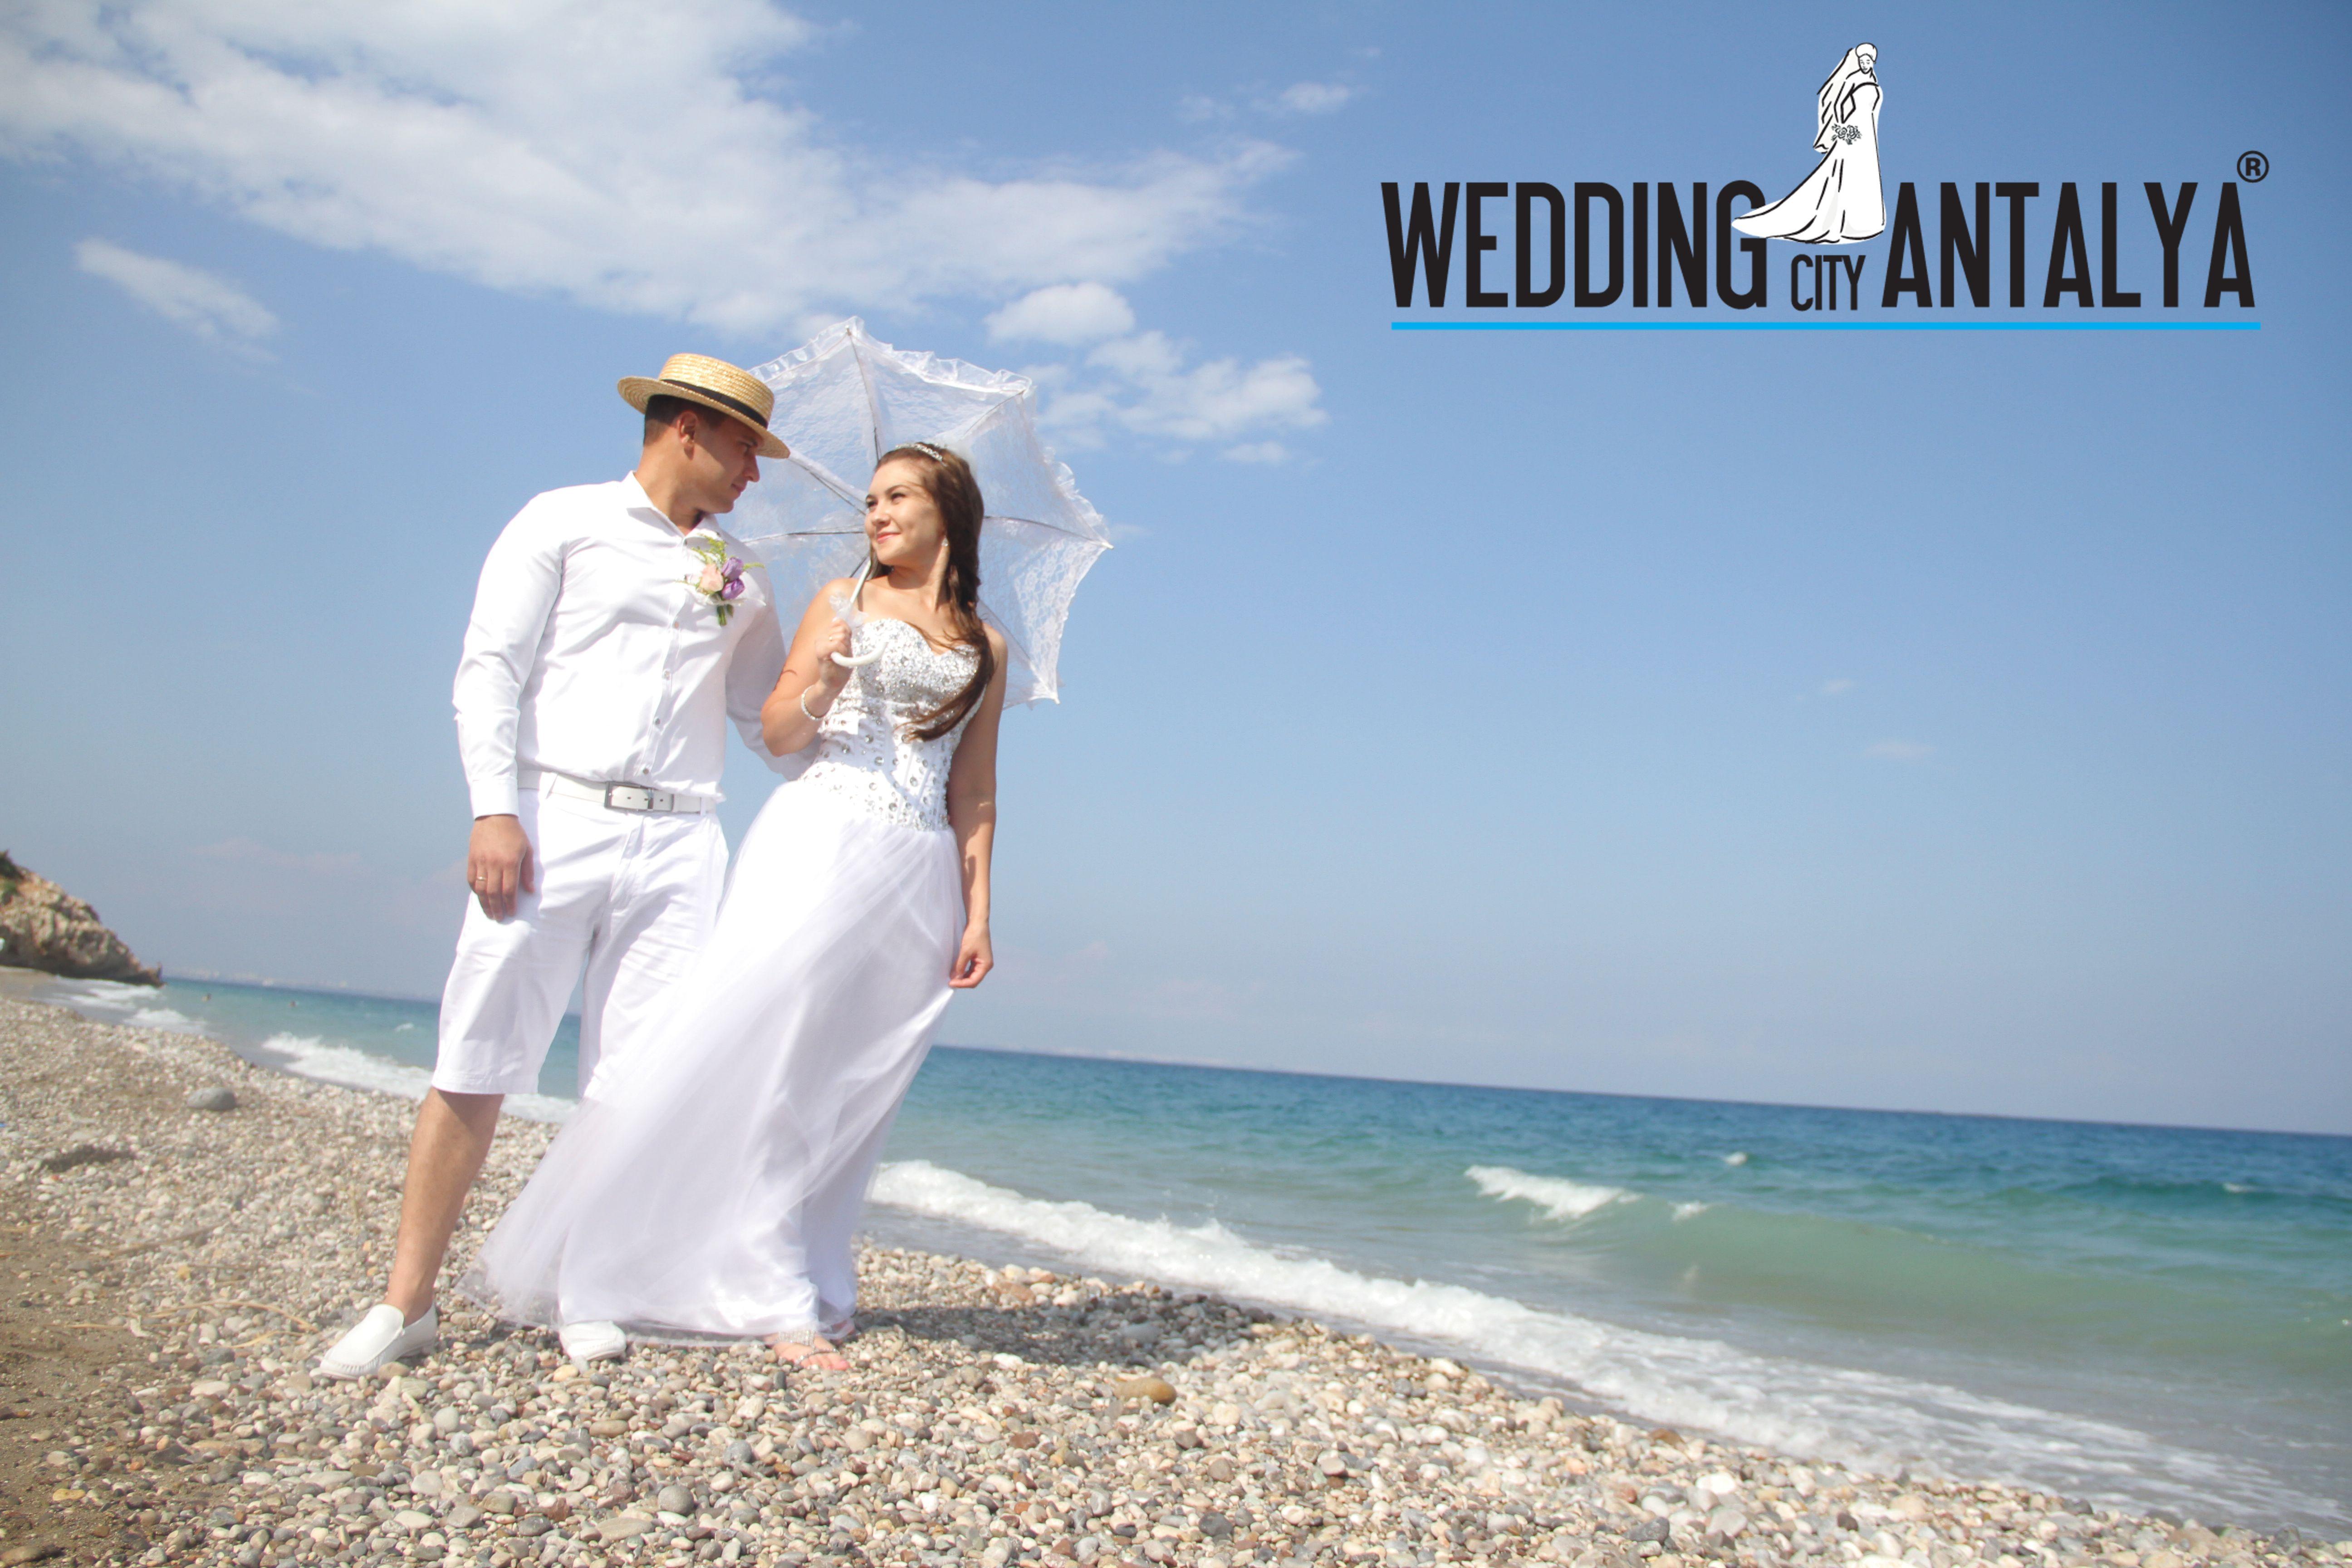 Romantic Wedding In Antalya Best Wedding Destinations Wedding Planner Best Wedding Venues